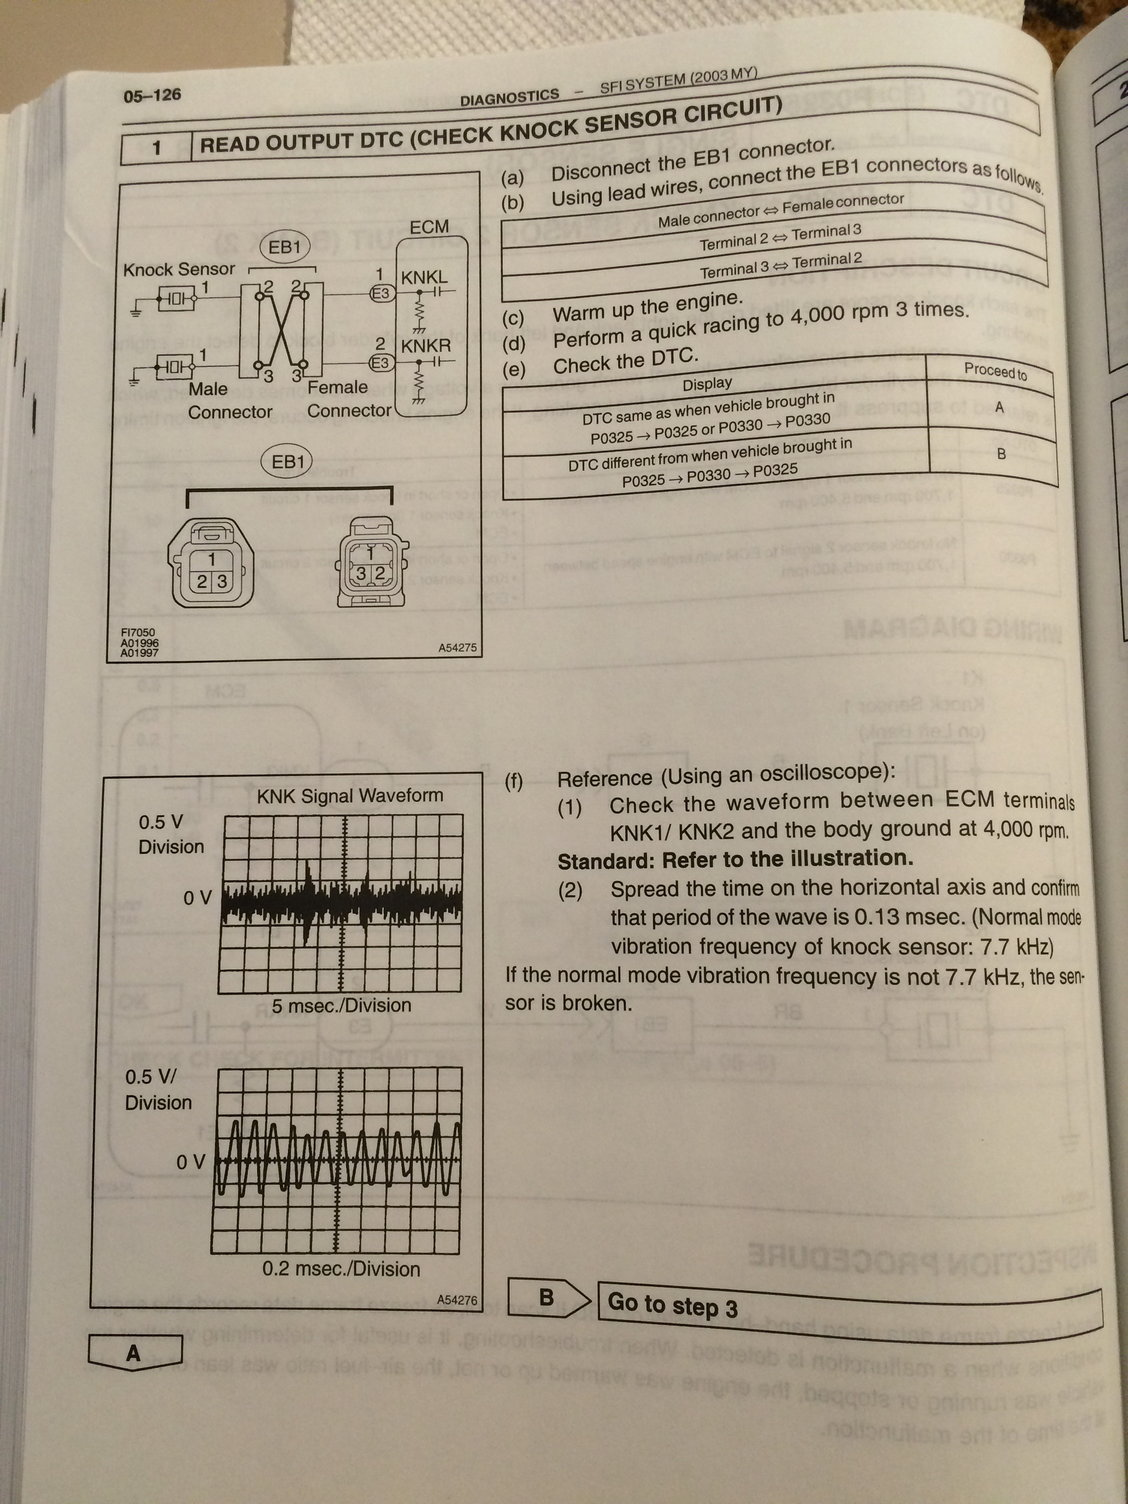 hight resolution of p0330 and p0325 knock sensor clublexus lexus forum discussion vapor canister diagram knock sensor diagram is250